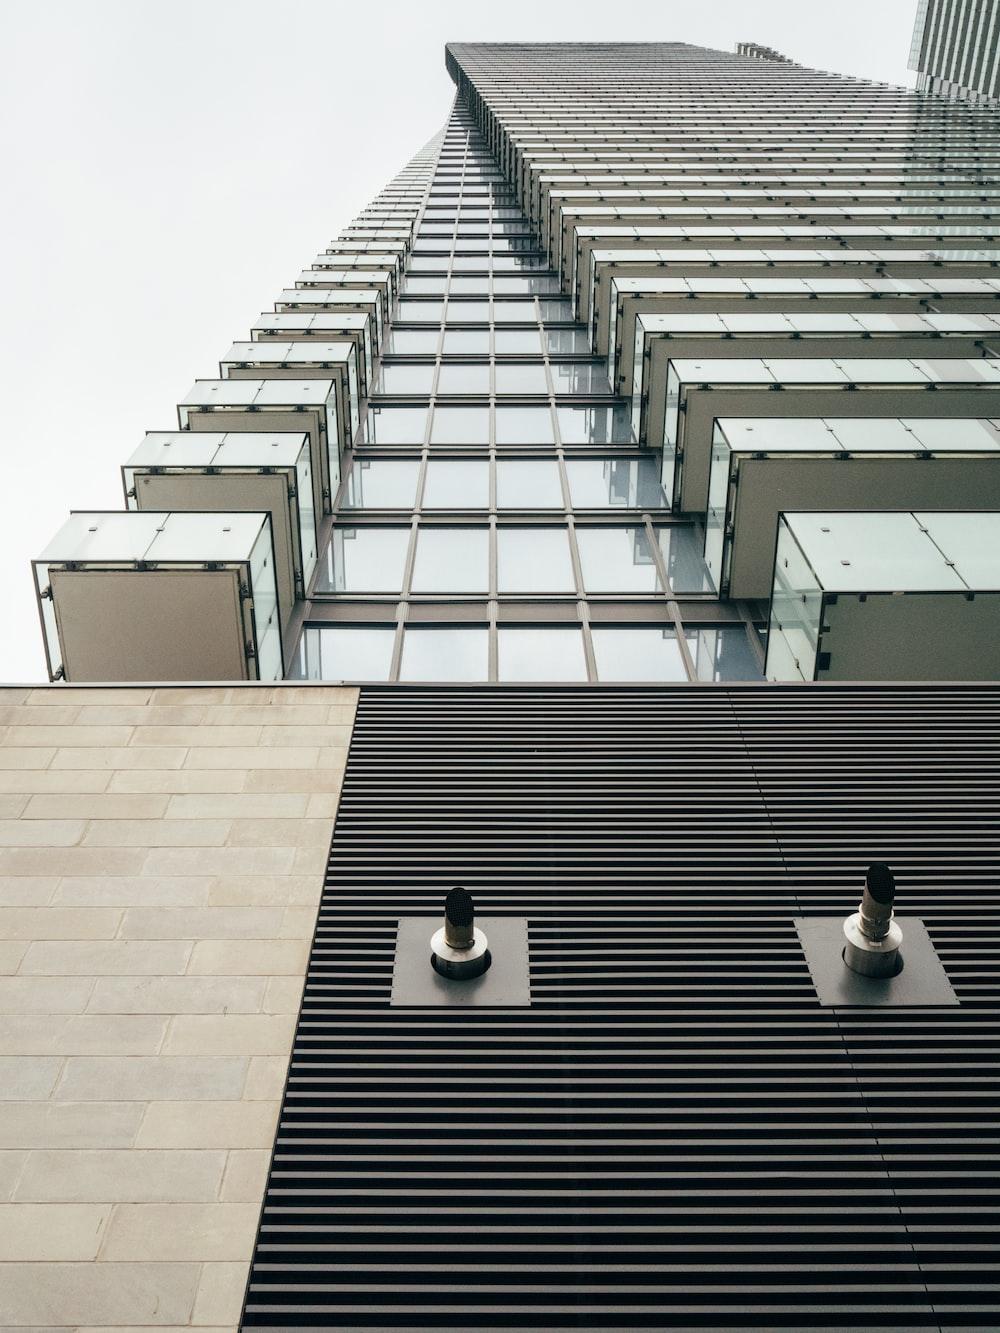 worm's-eye view of skyscraper